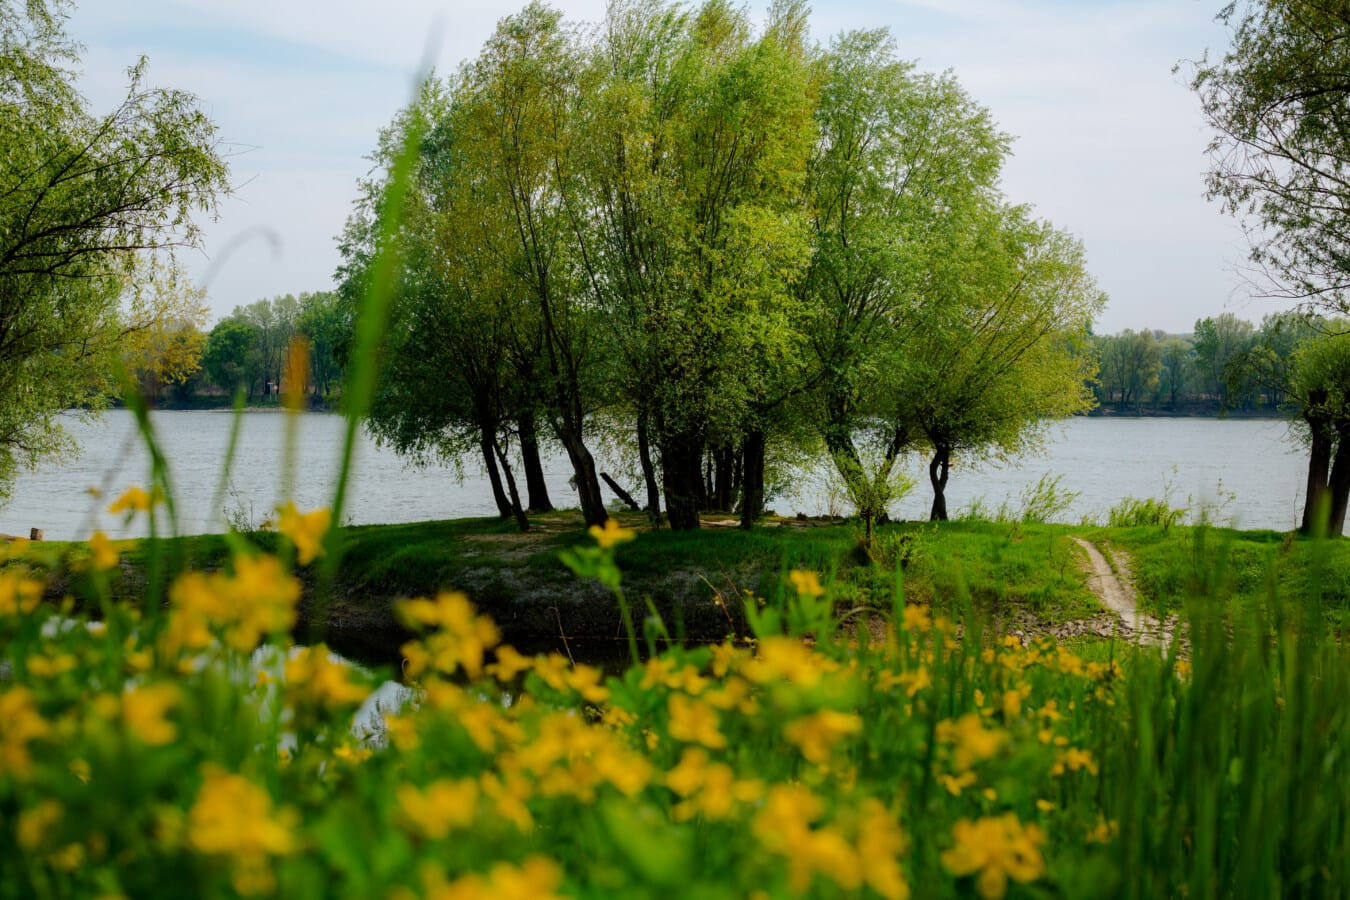 riverbank, river, plant, yellow, landscape, tree, nature, park, leaf, sun